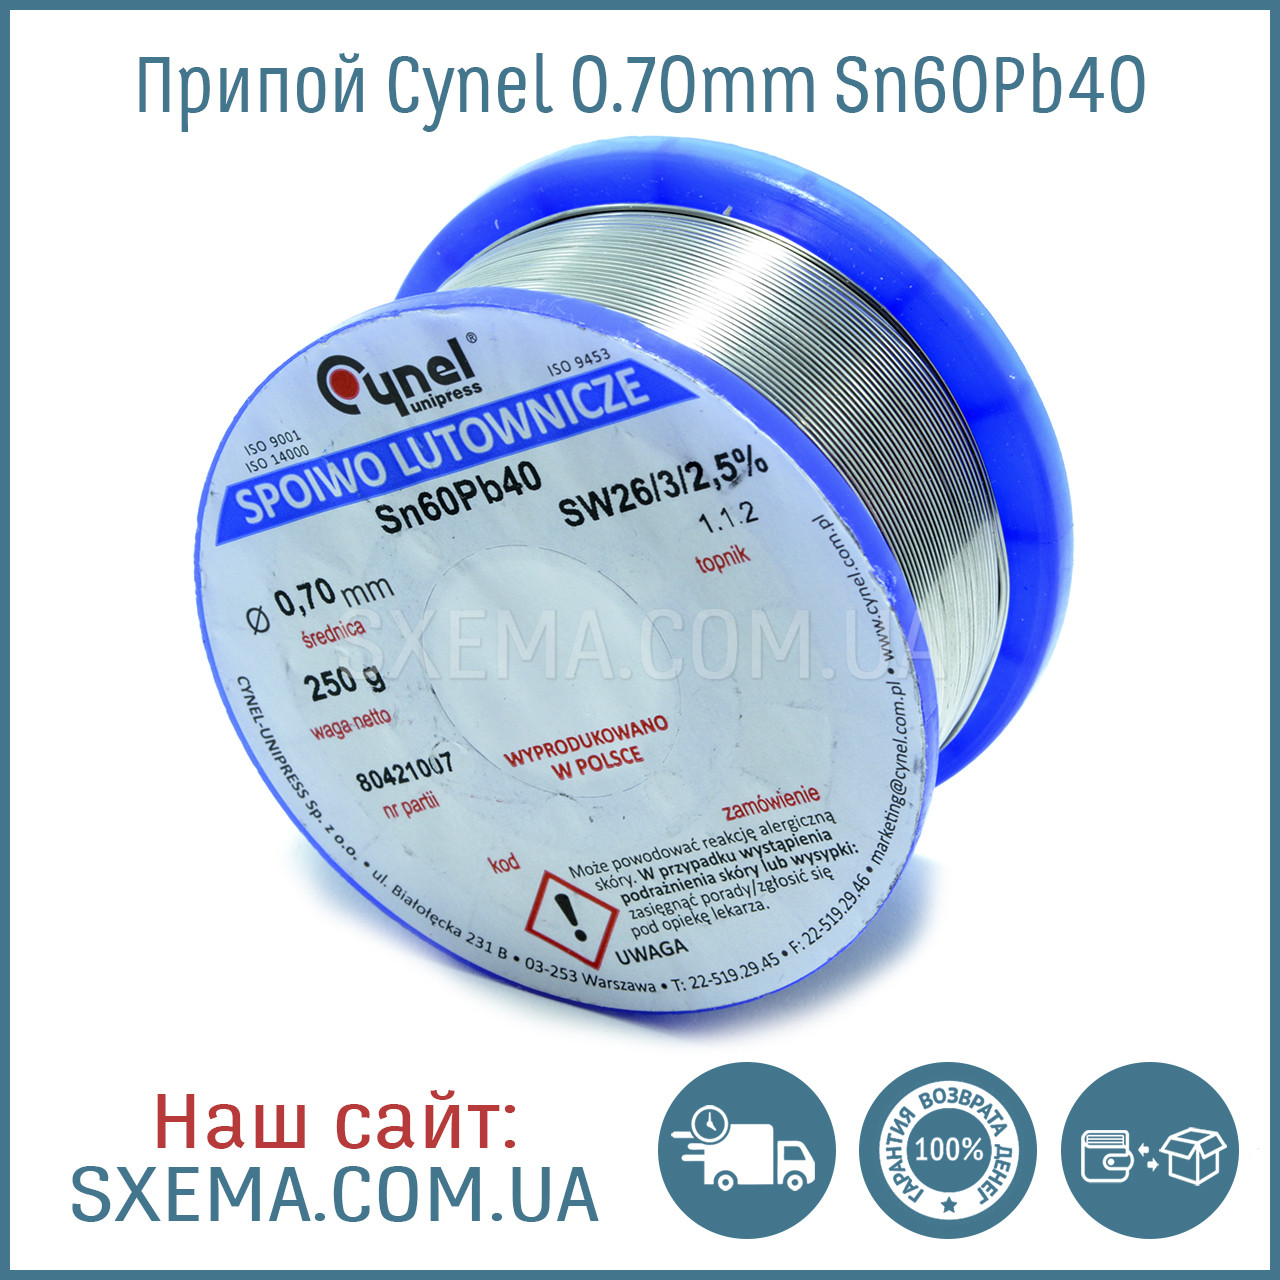 Припой для пайки, оловянно-свинцовый Cynel SW26/3/2.5 250гр 0.7мм